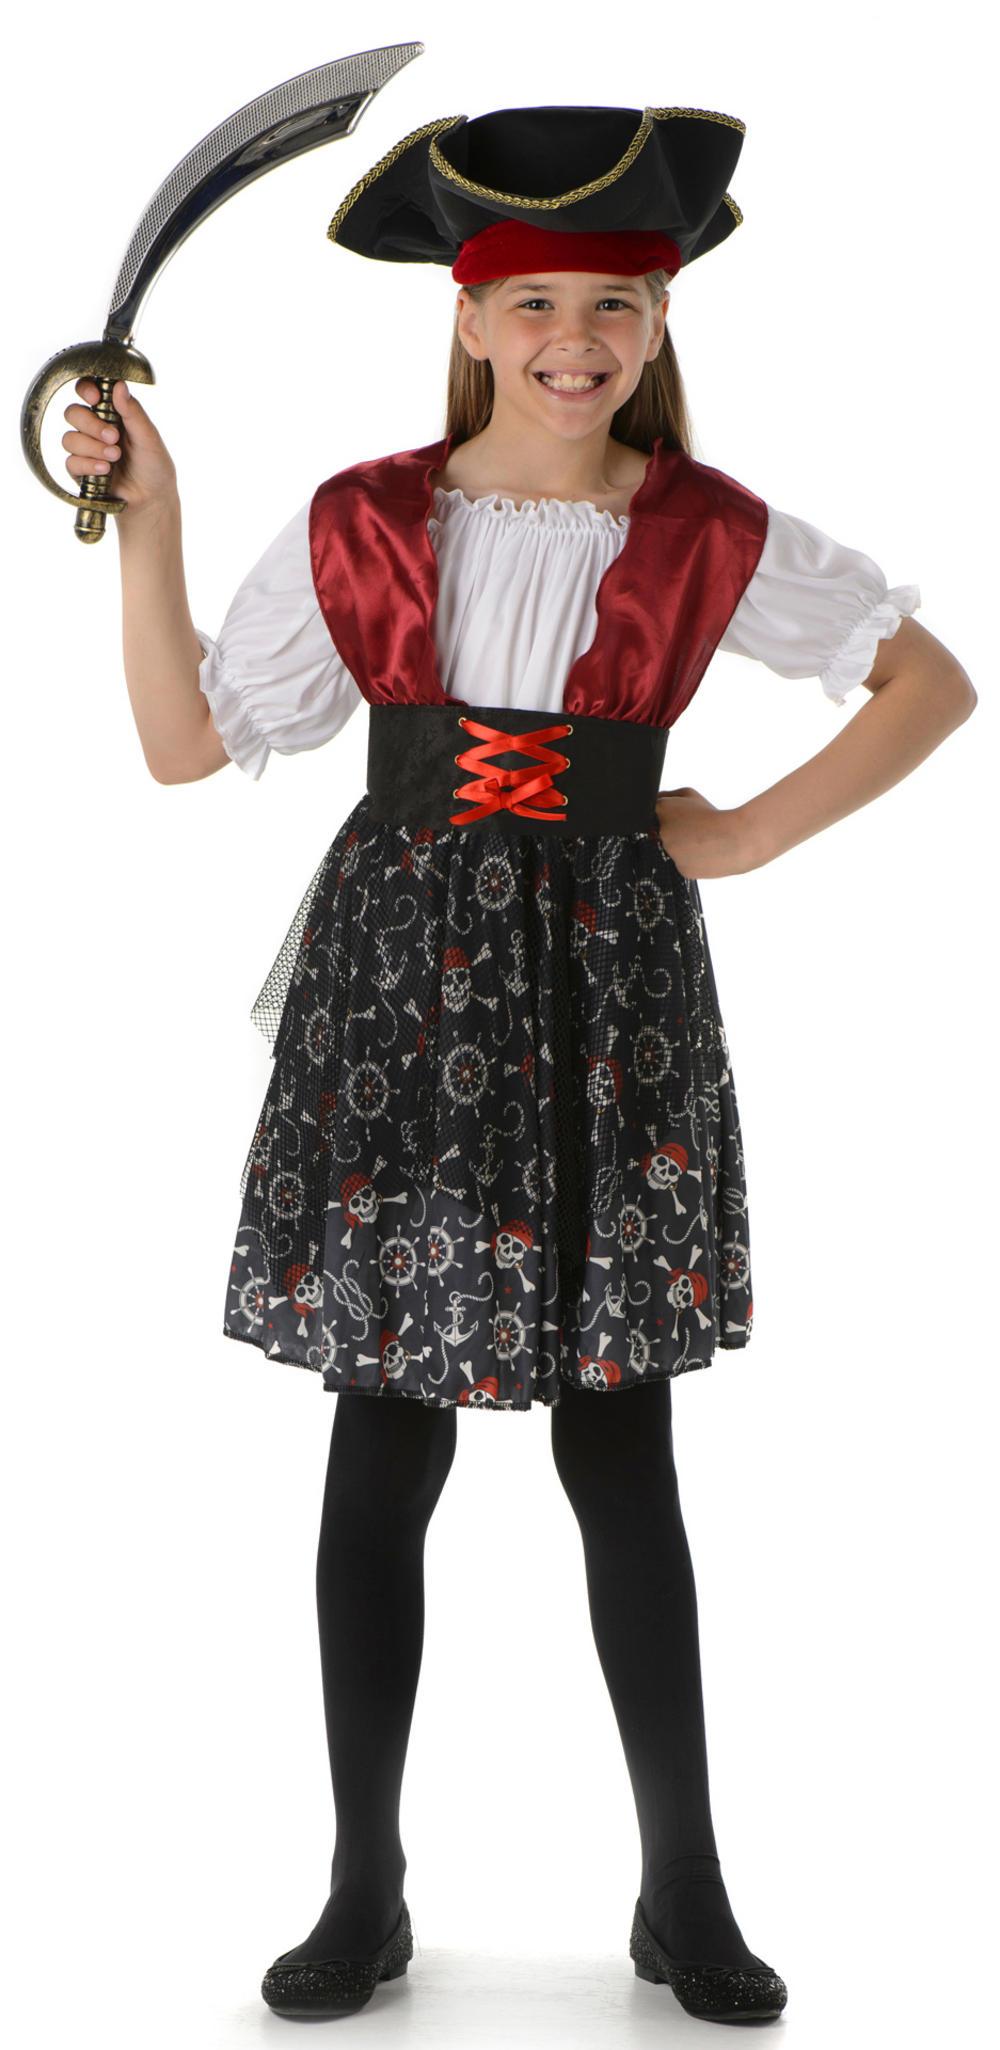 Girls Pirate Beauty Costume